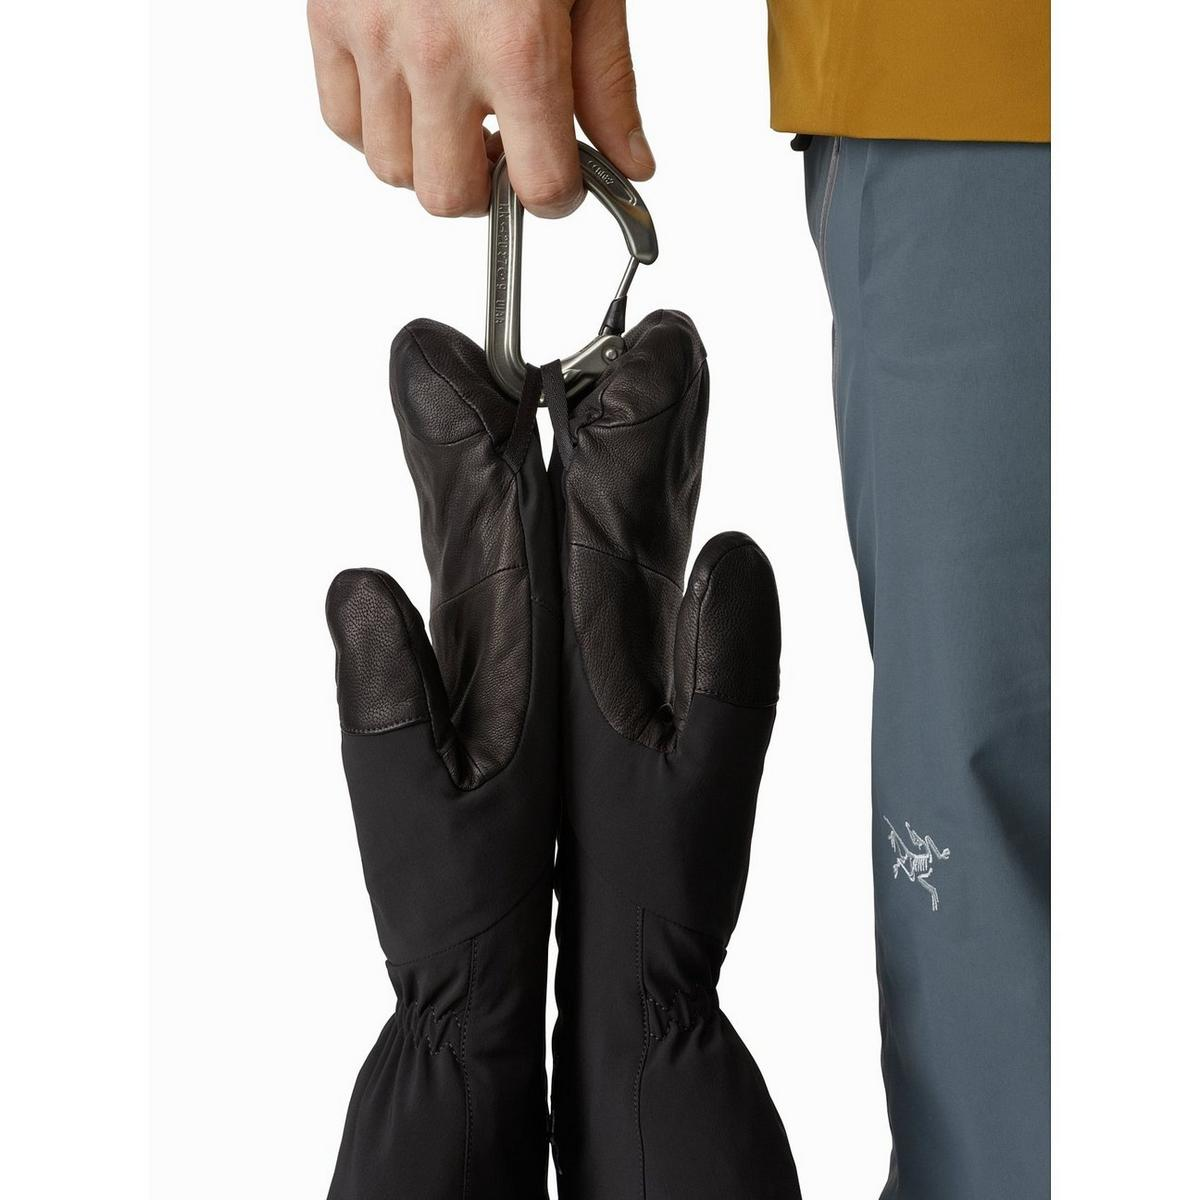 Arcteryx Unisex Arc'teryx Waterproof Fission SV Mittens - Black